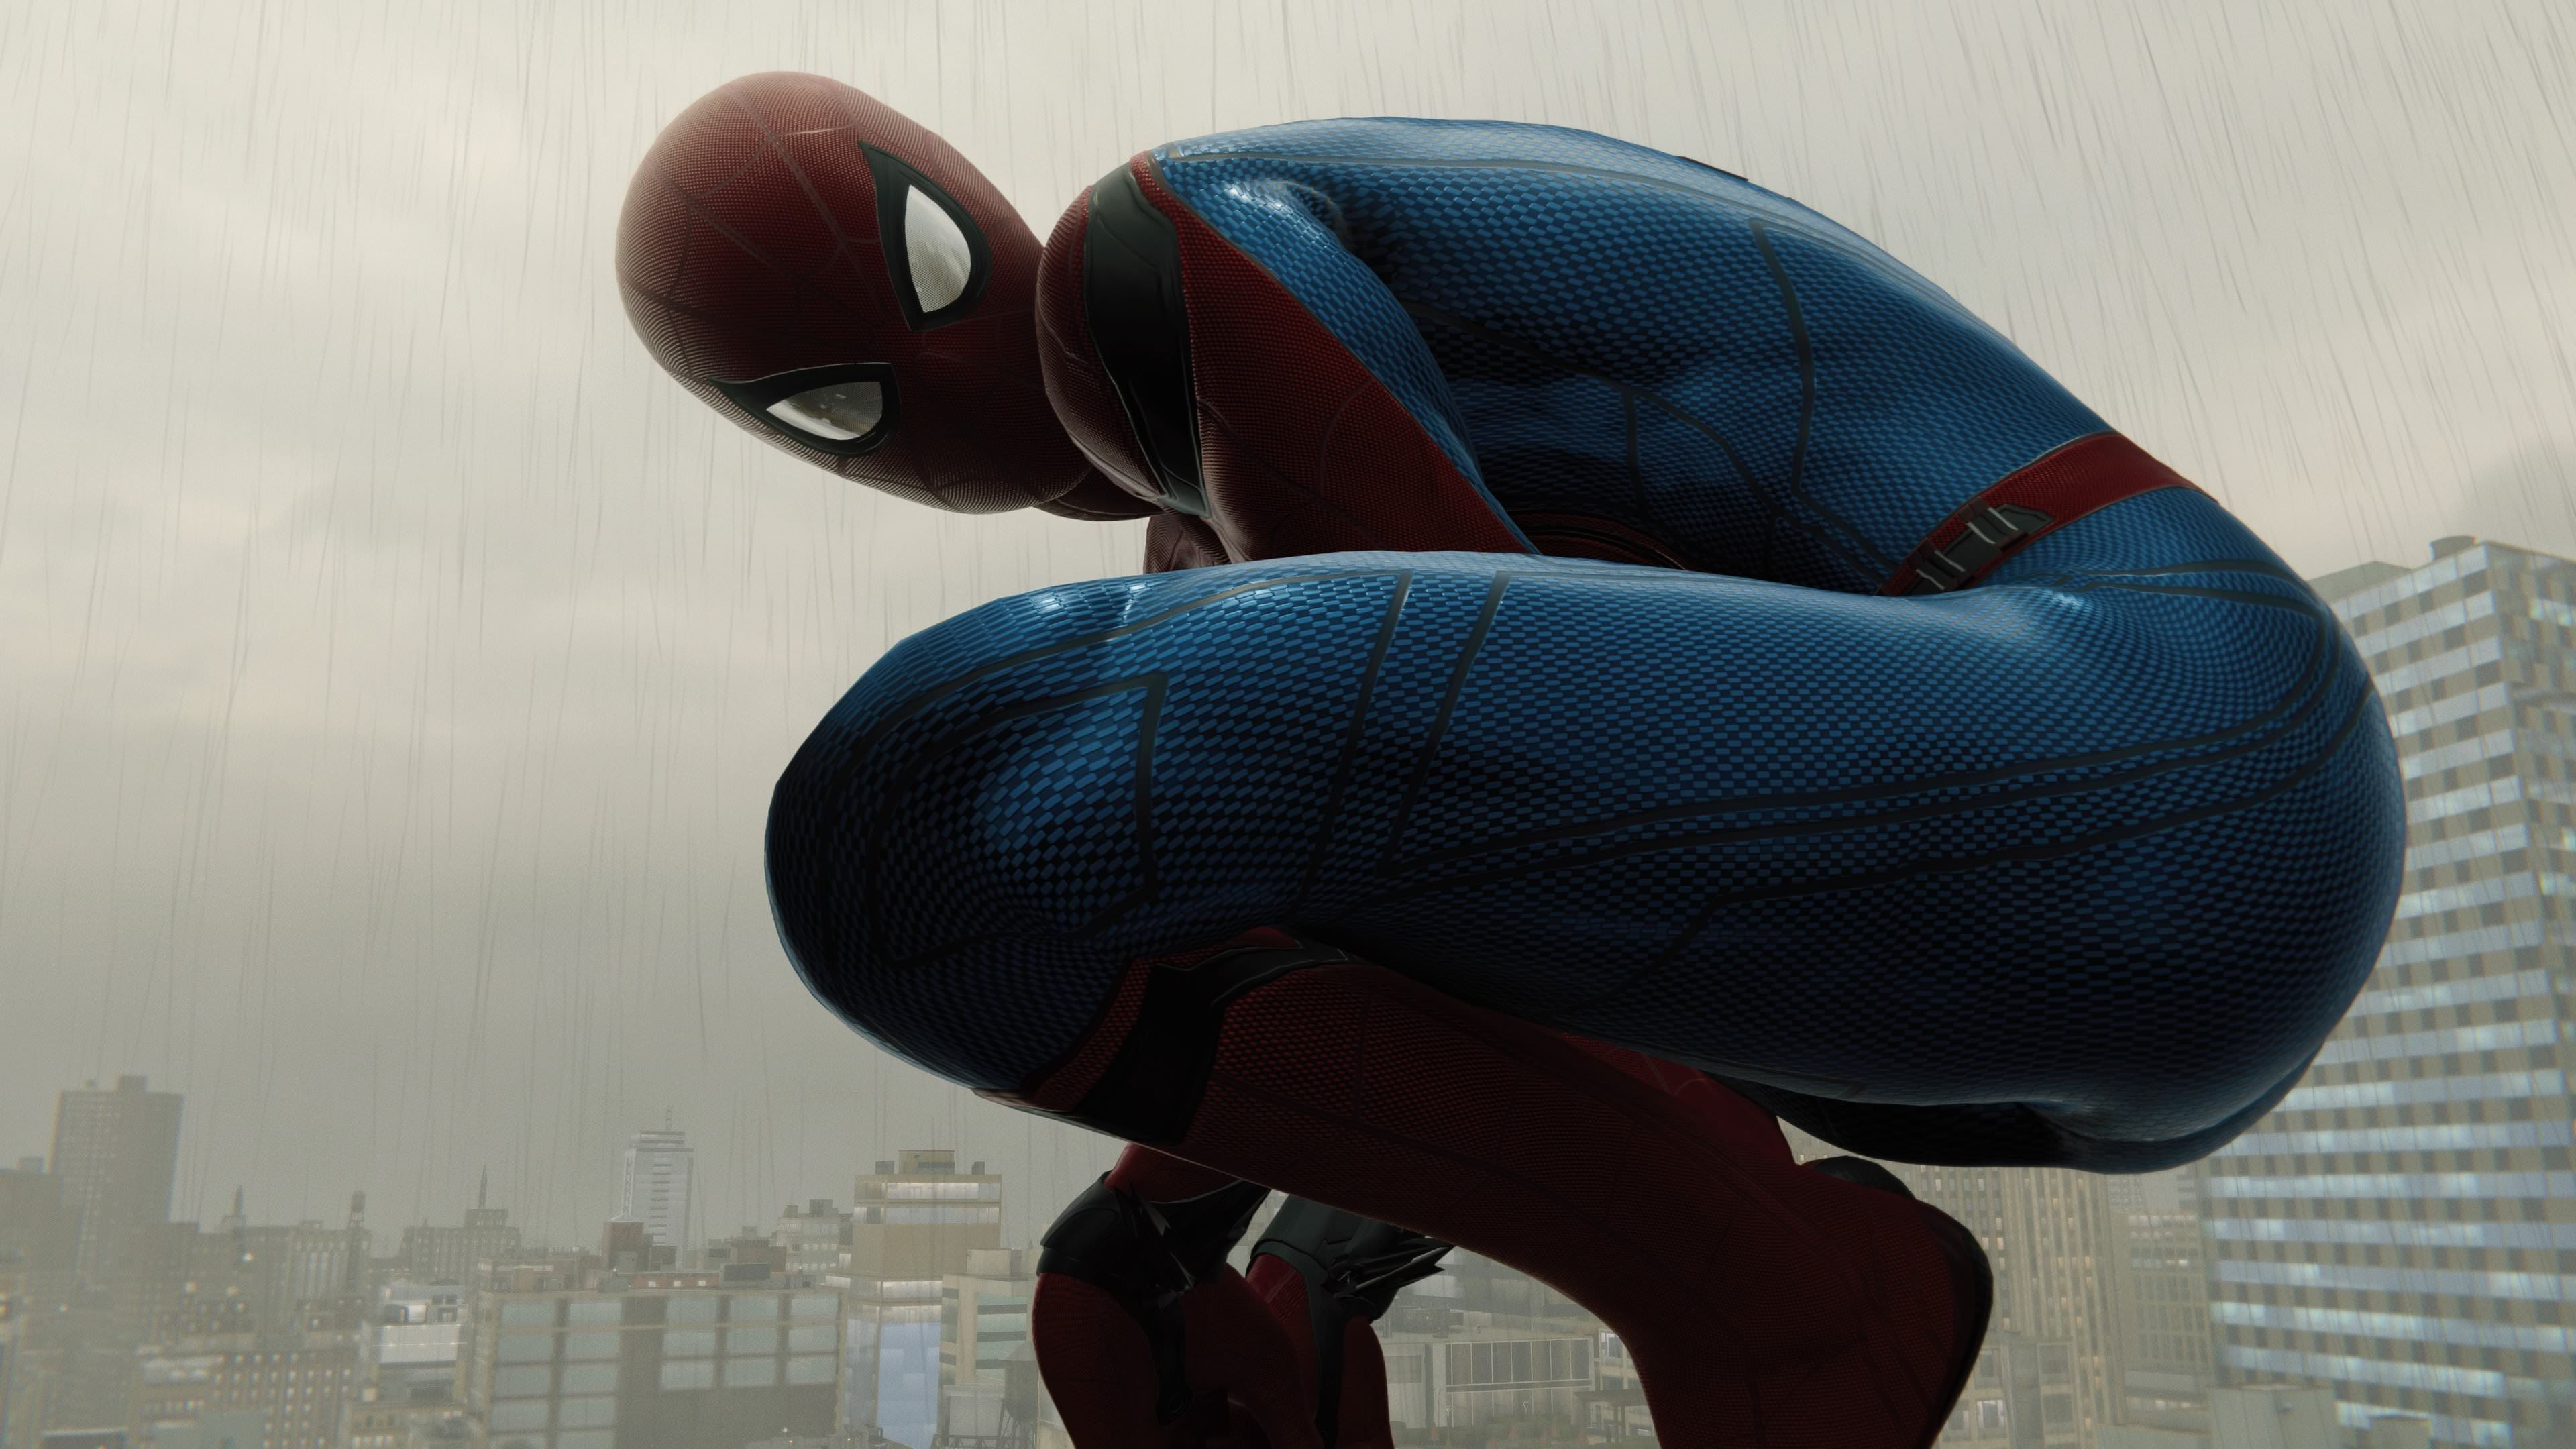 Spiderman ps4 2018 hd games 4k wallpapers images - Ps4 wallpaper hd ...